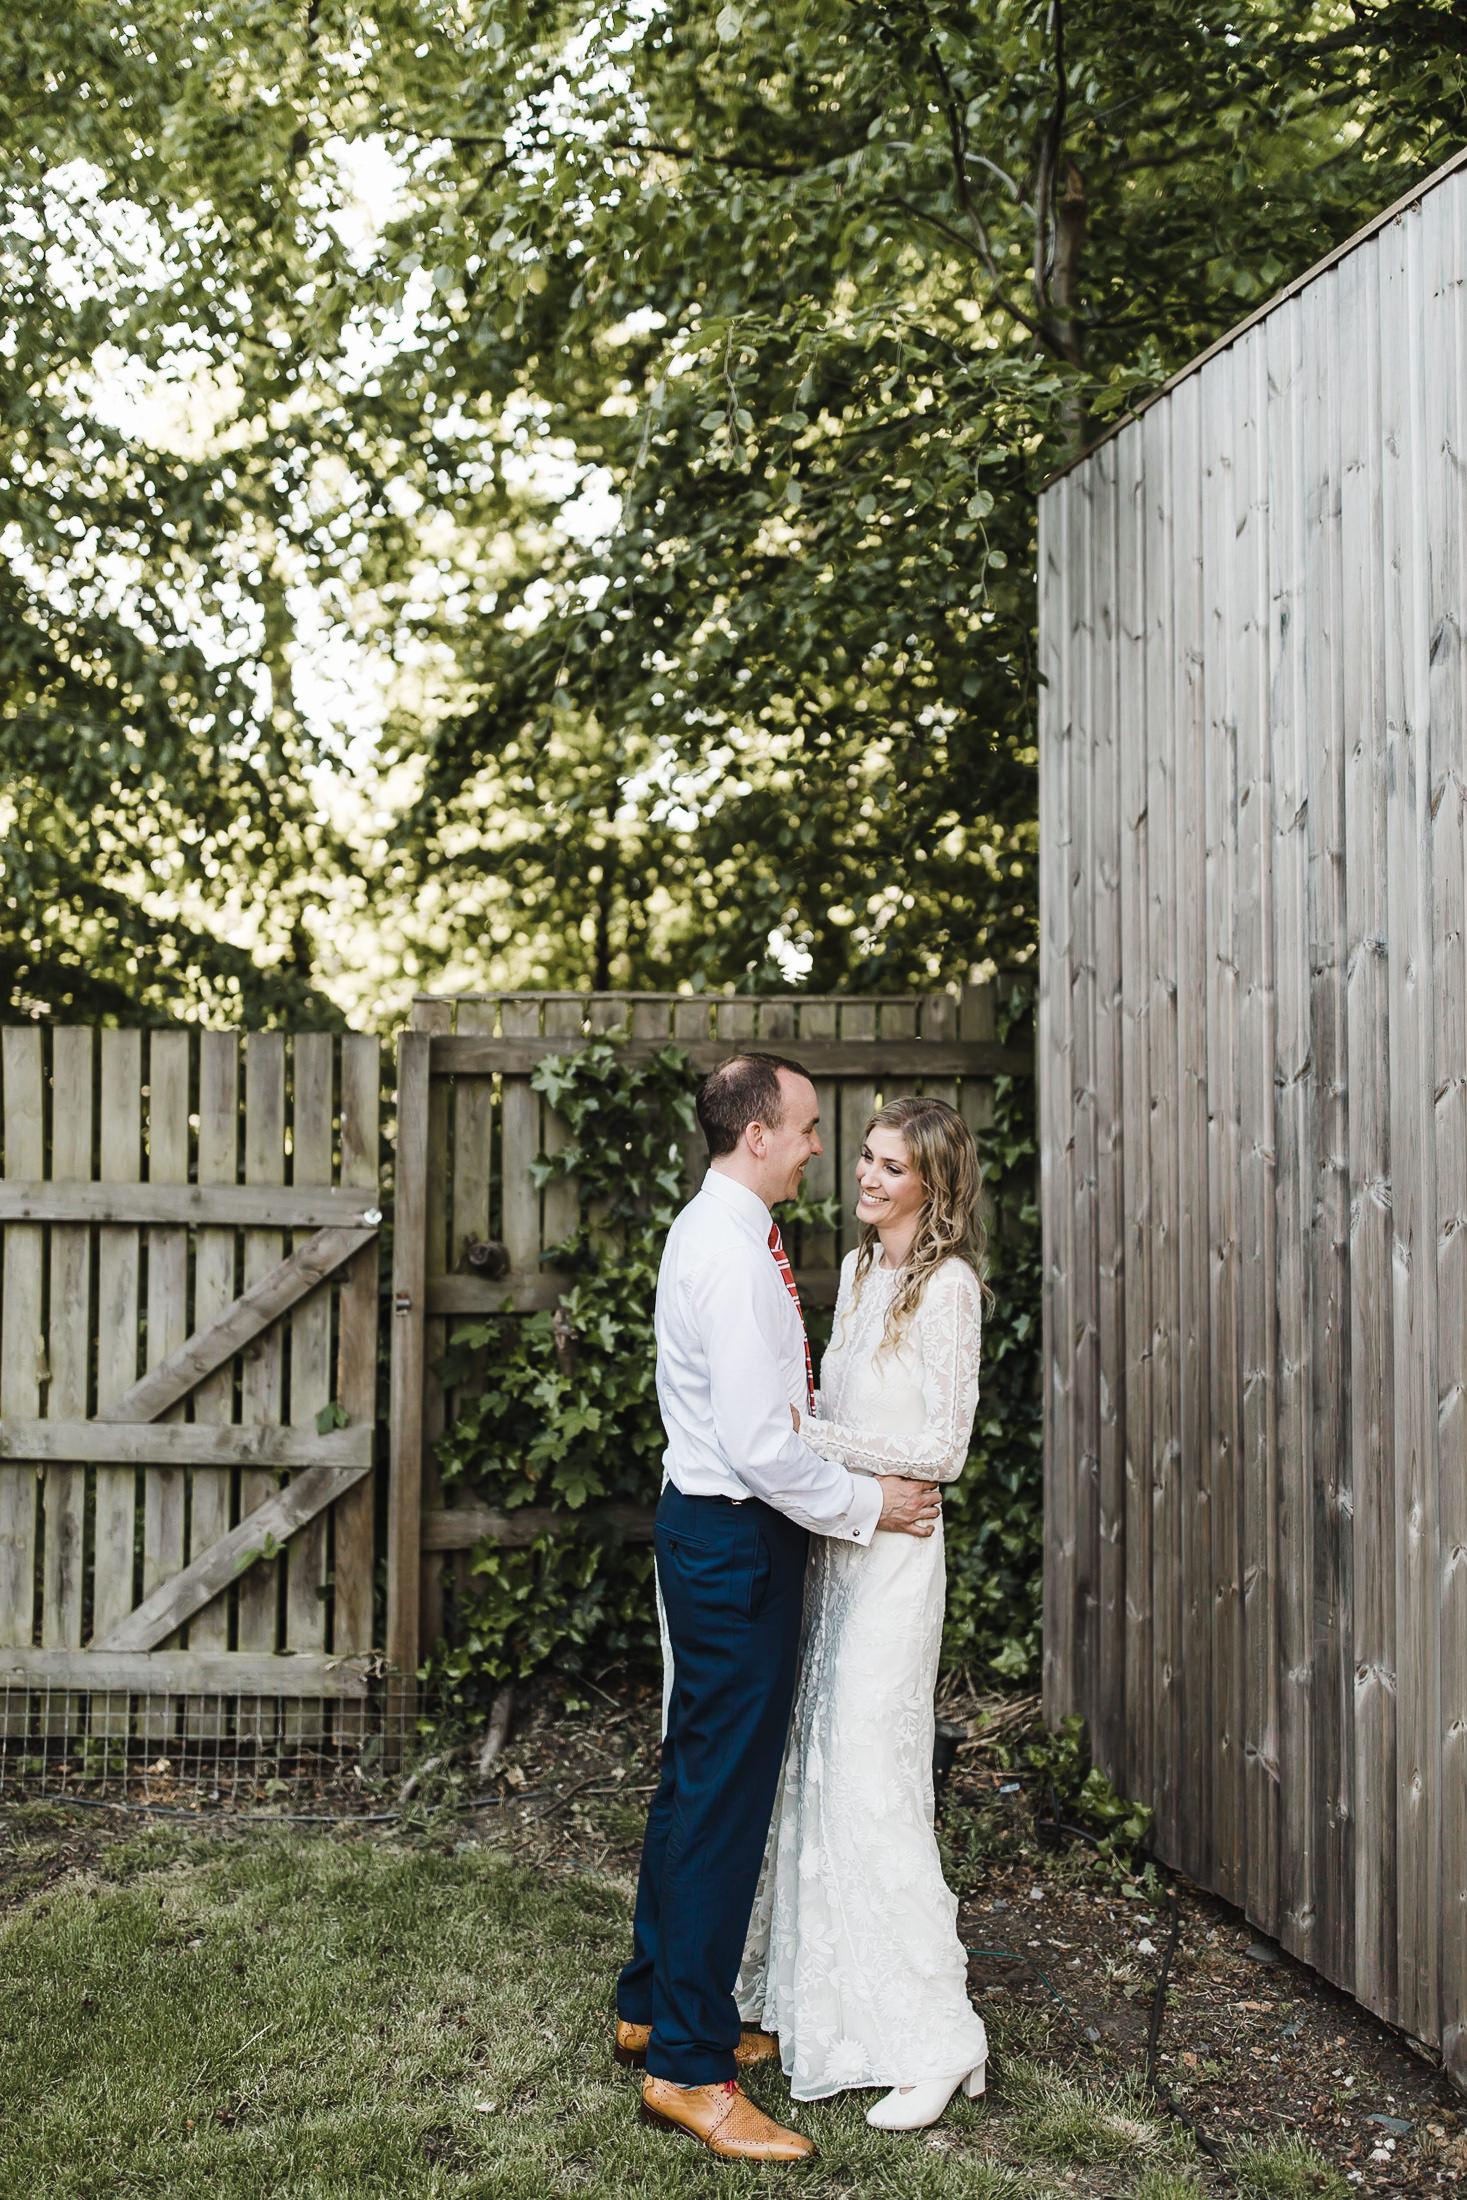 Roundhay-Leeds-Backyard-Wedding-Becs-Chris-178.jpg